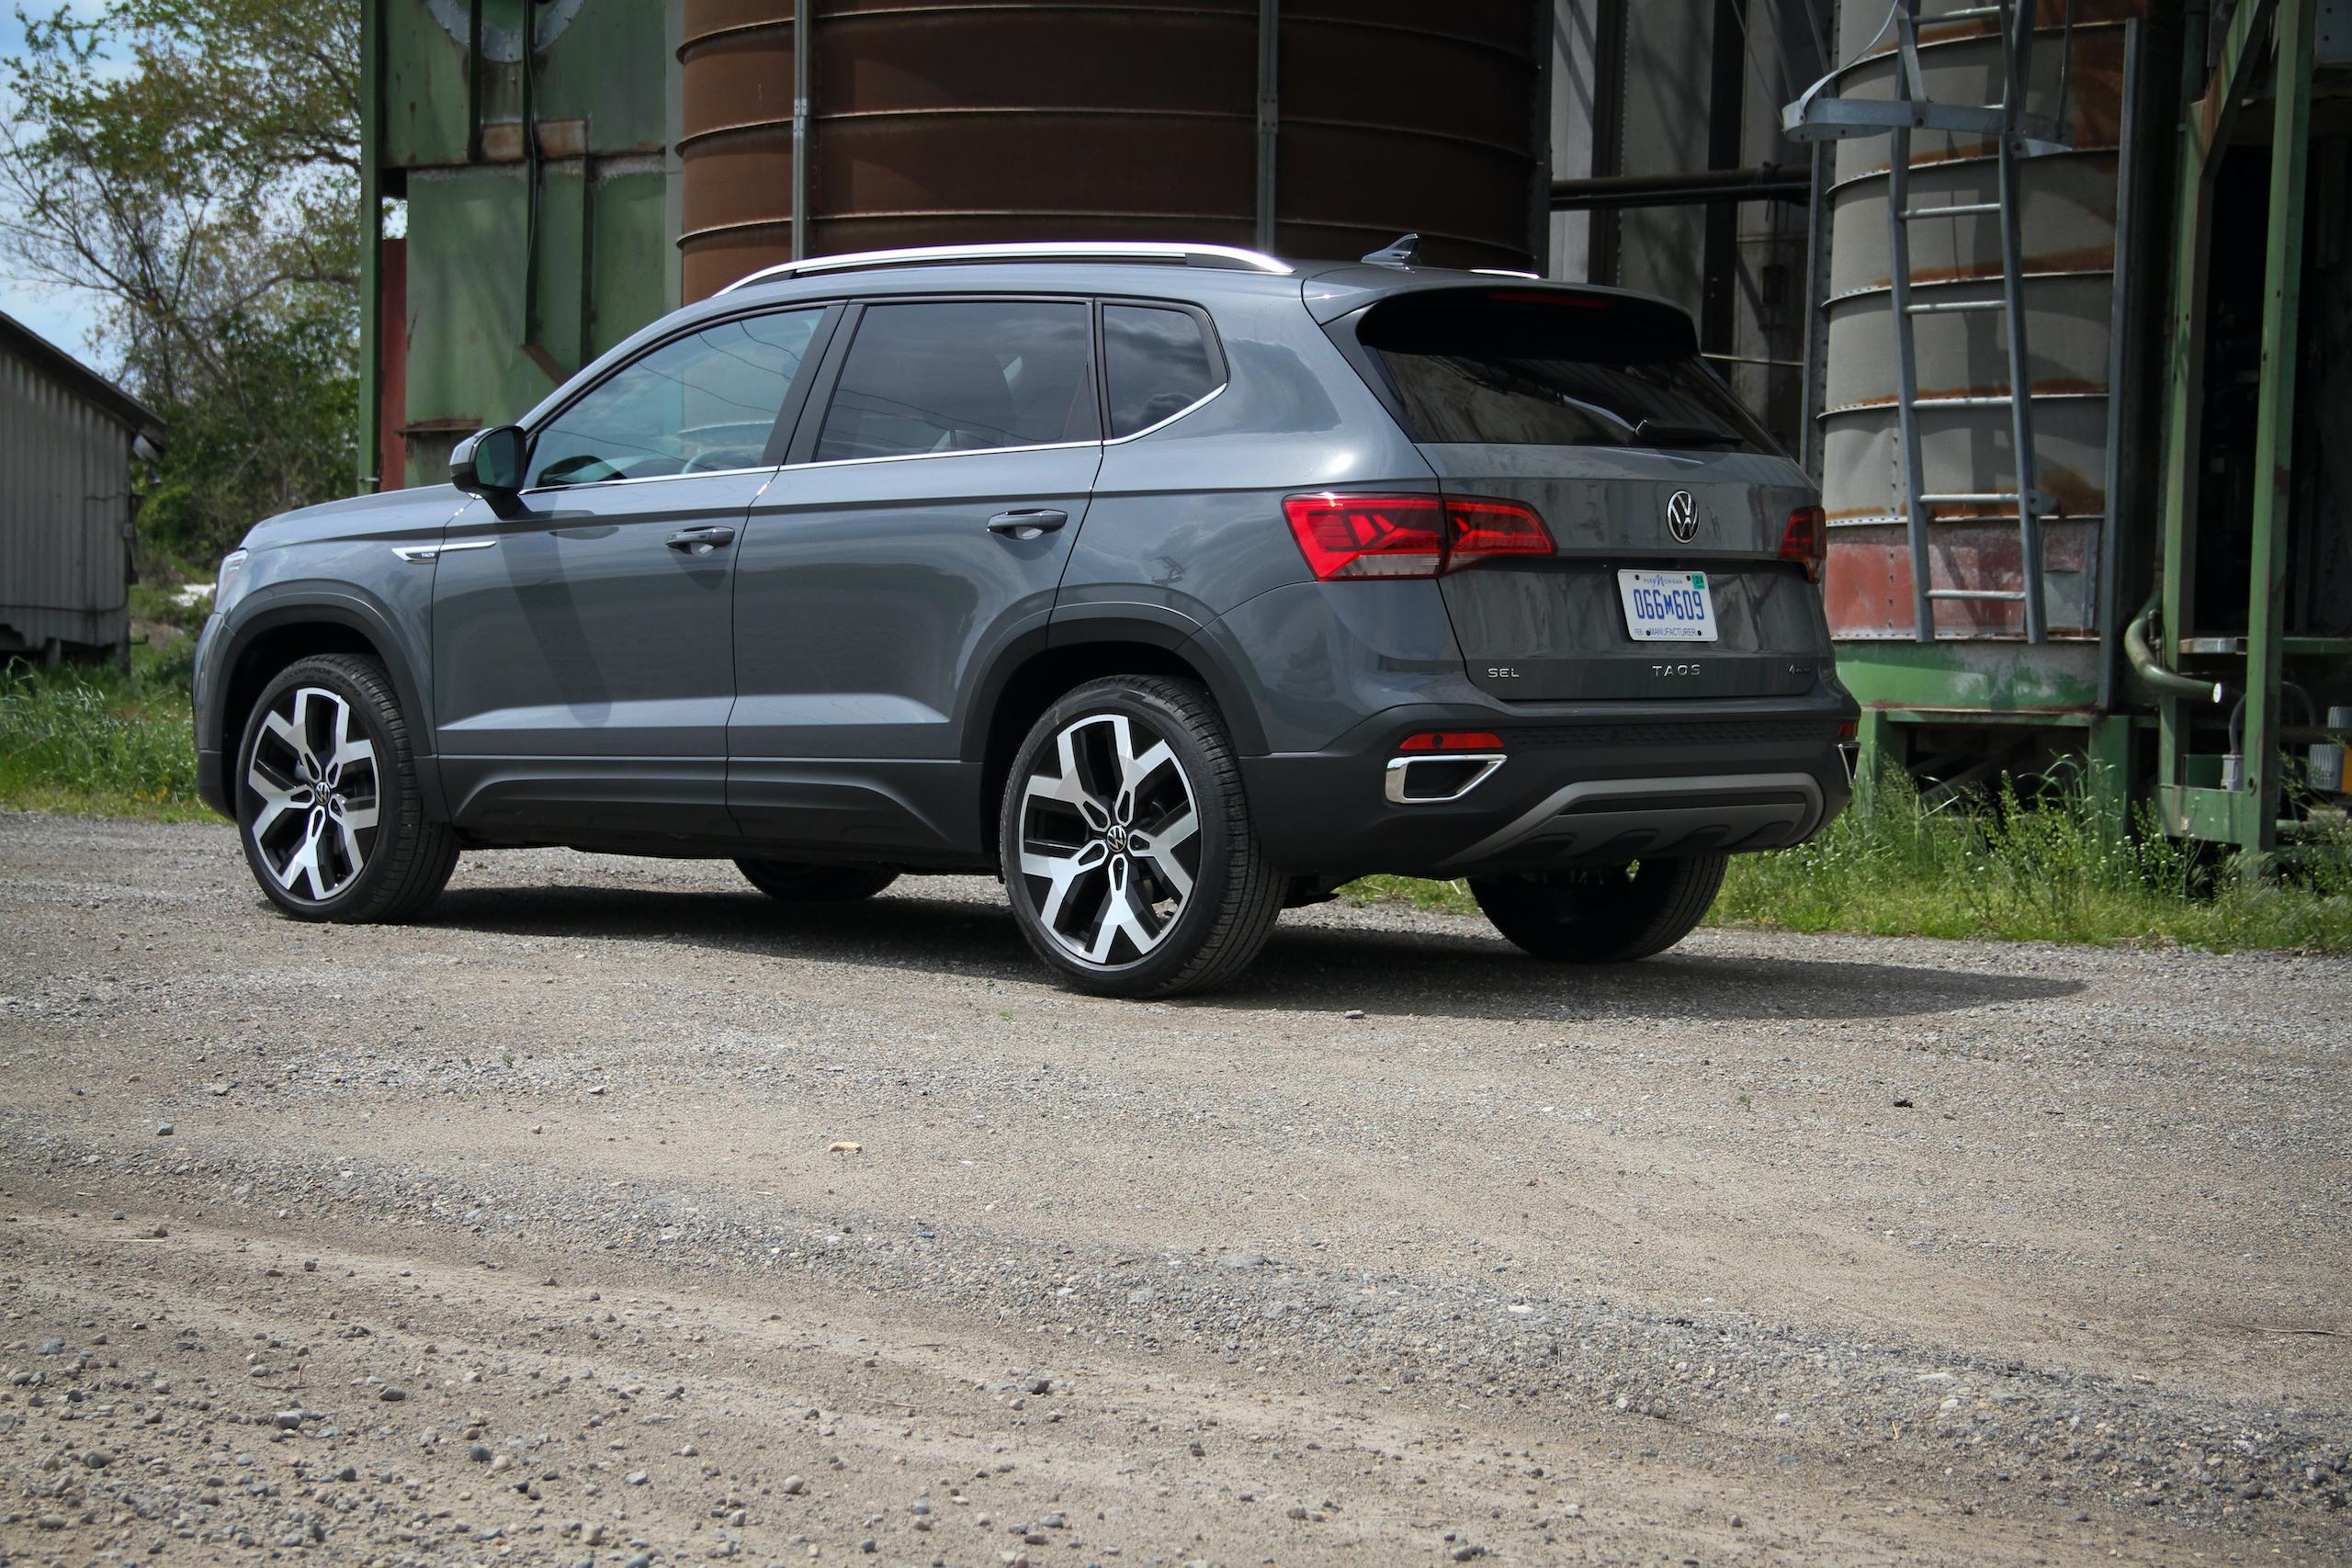 2022 Volkswagen Taos SEL AWD rear three-quarter